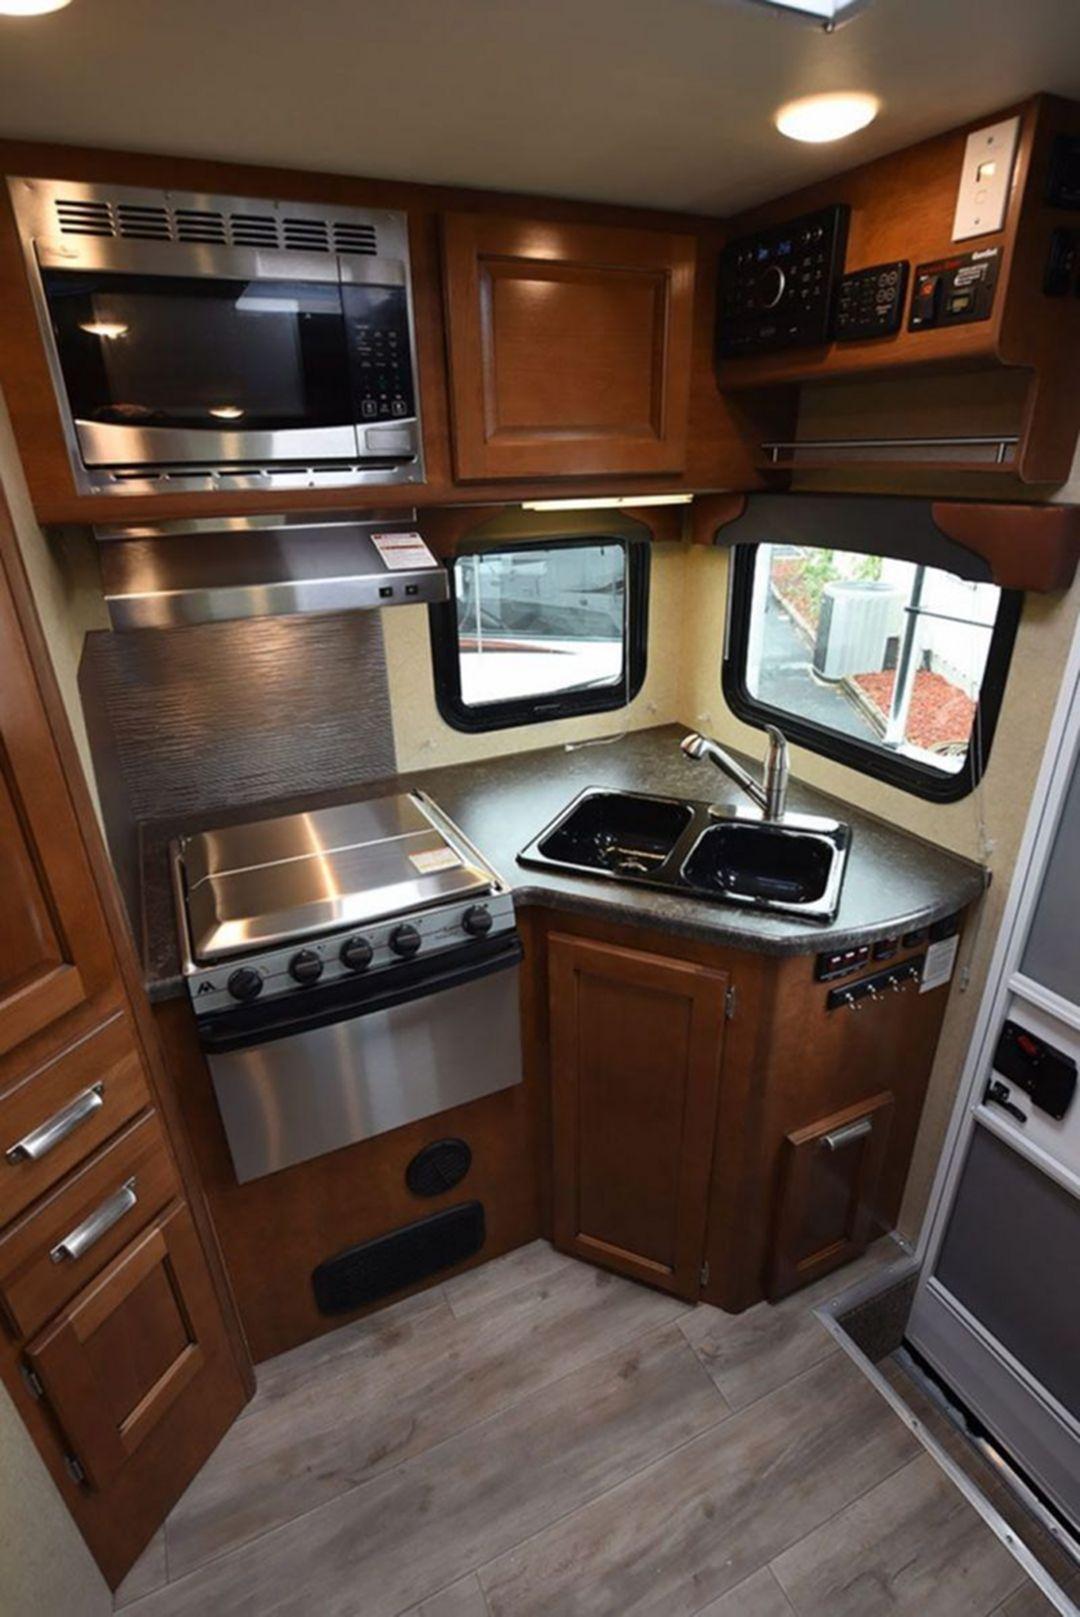 Best 20 Rv Camper Kitchen Renovations For Early Enjoyable Camping Preparation Ideas En 2020 Avec Images Camion Campeur Tente Caravane Campeurs Renovees